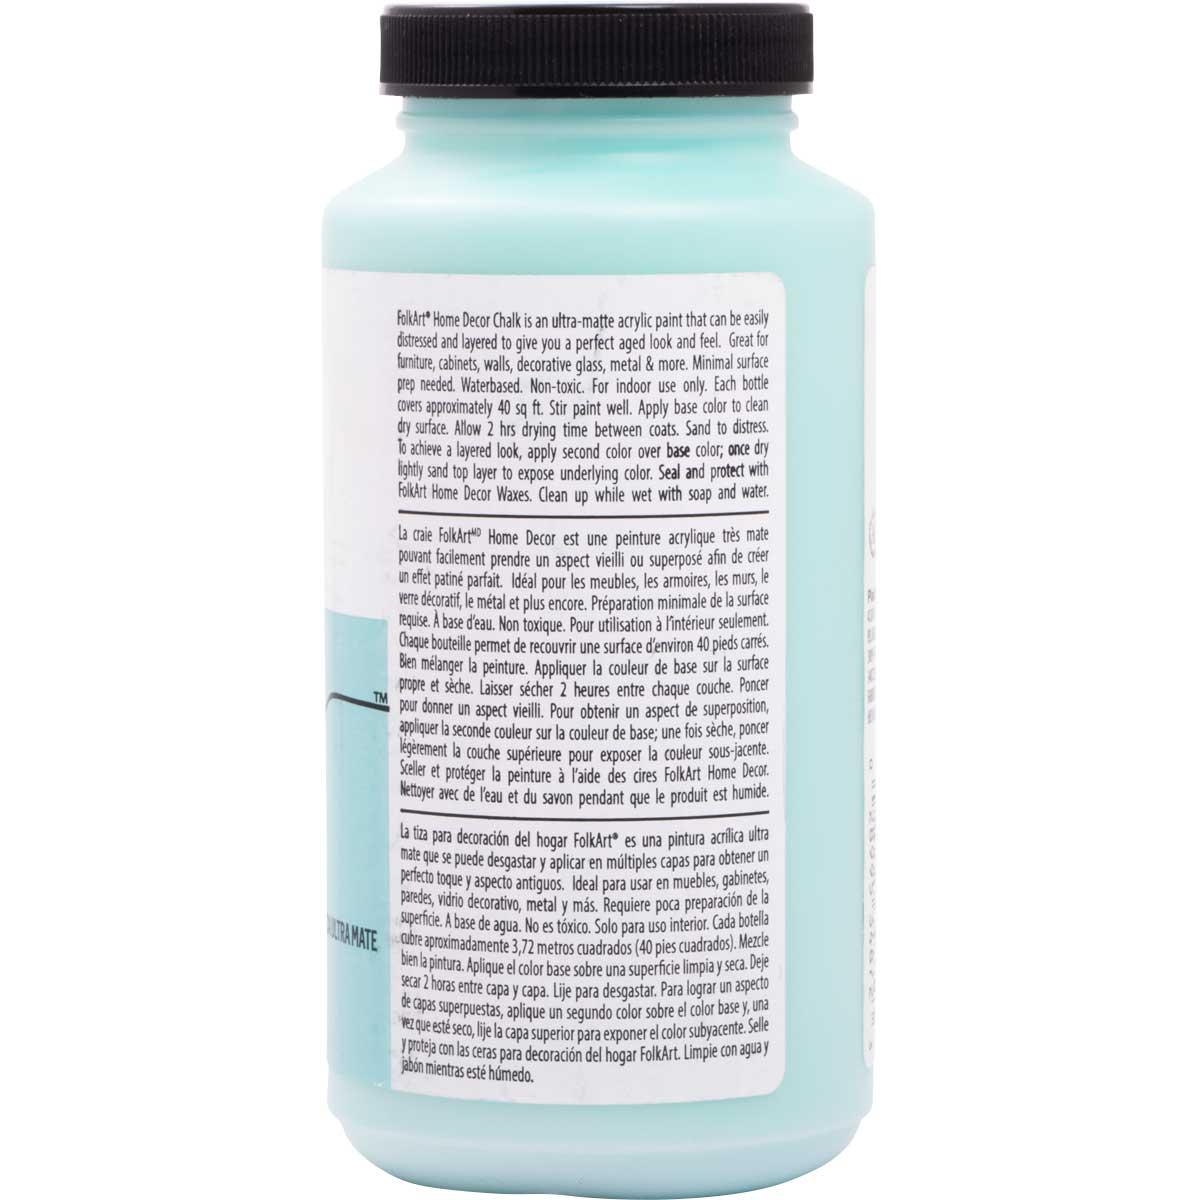 FolkArt ® Home Decor™ Chalk - Patina, 16 oz. - 34872